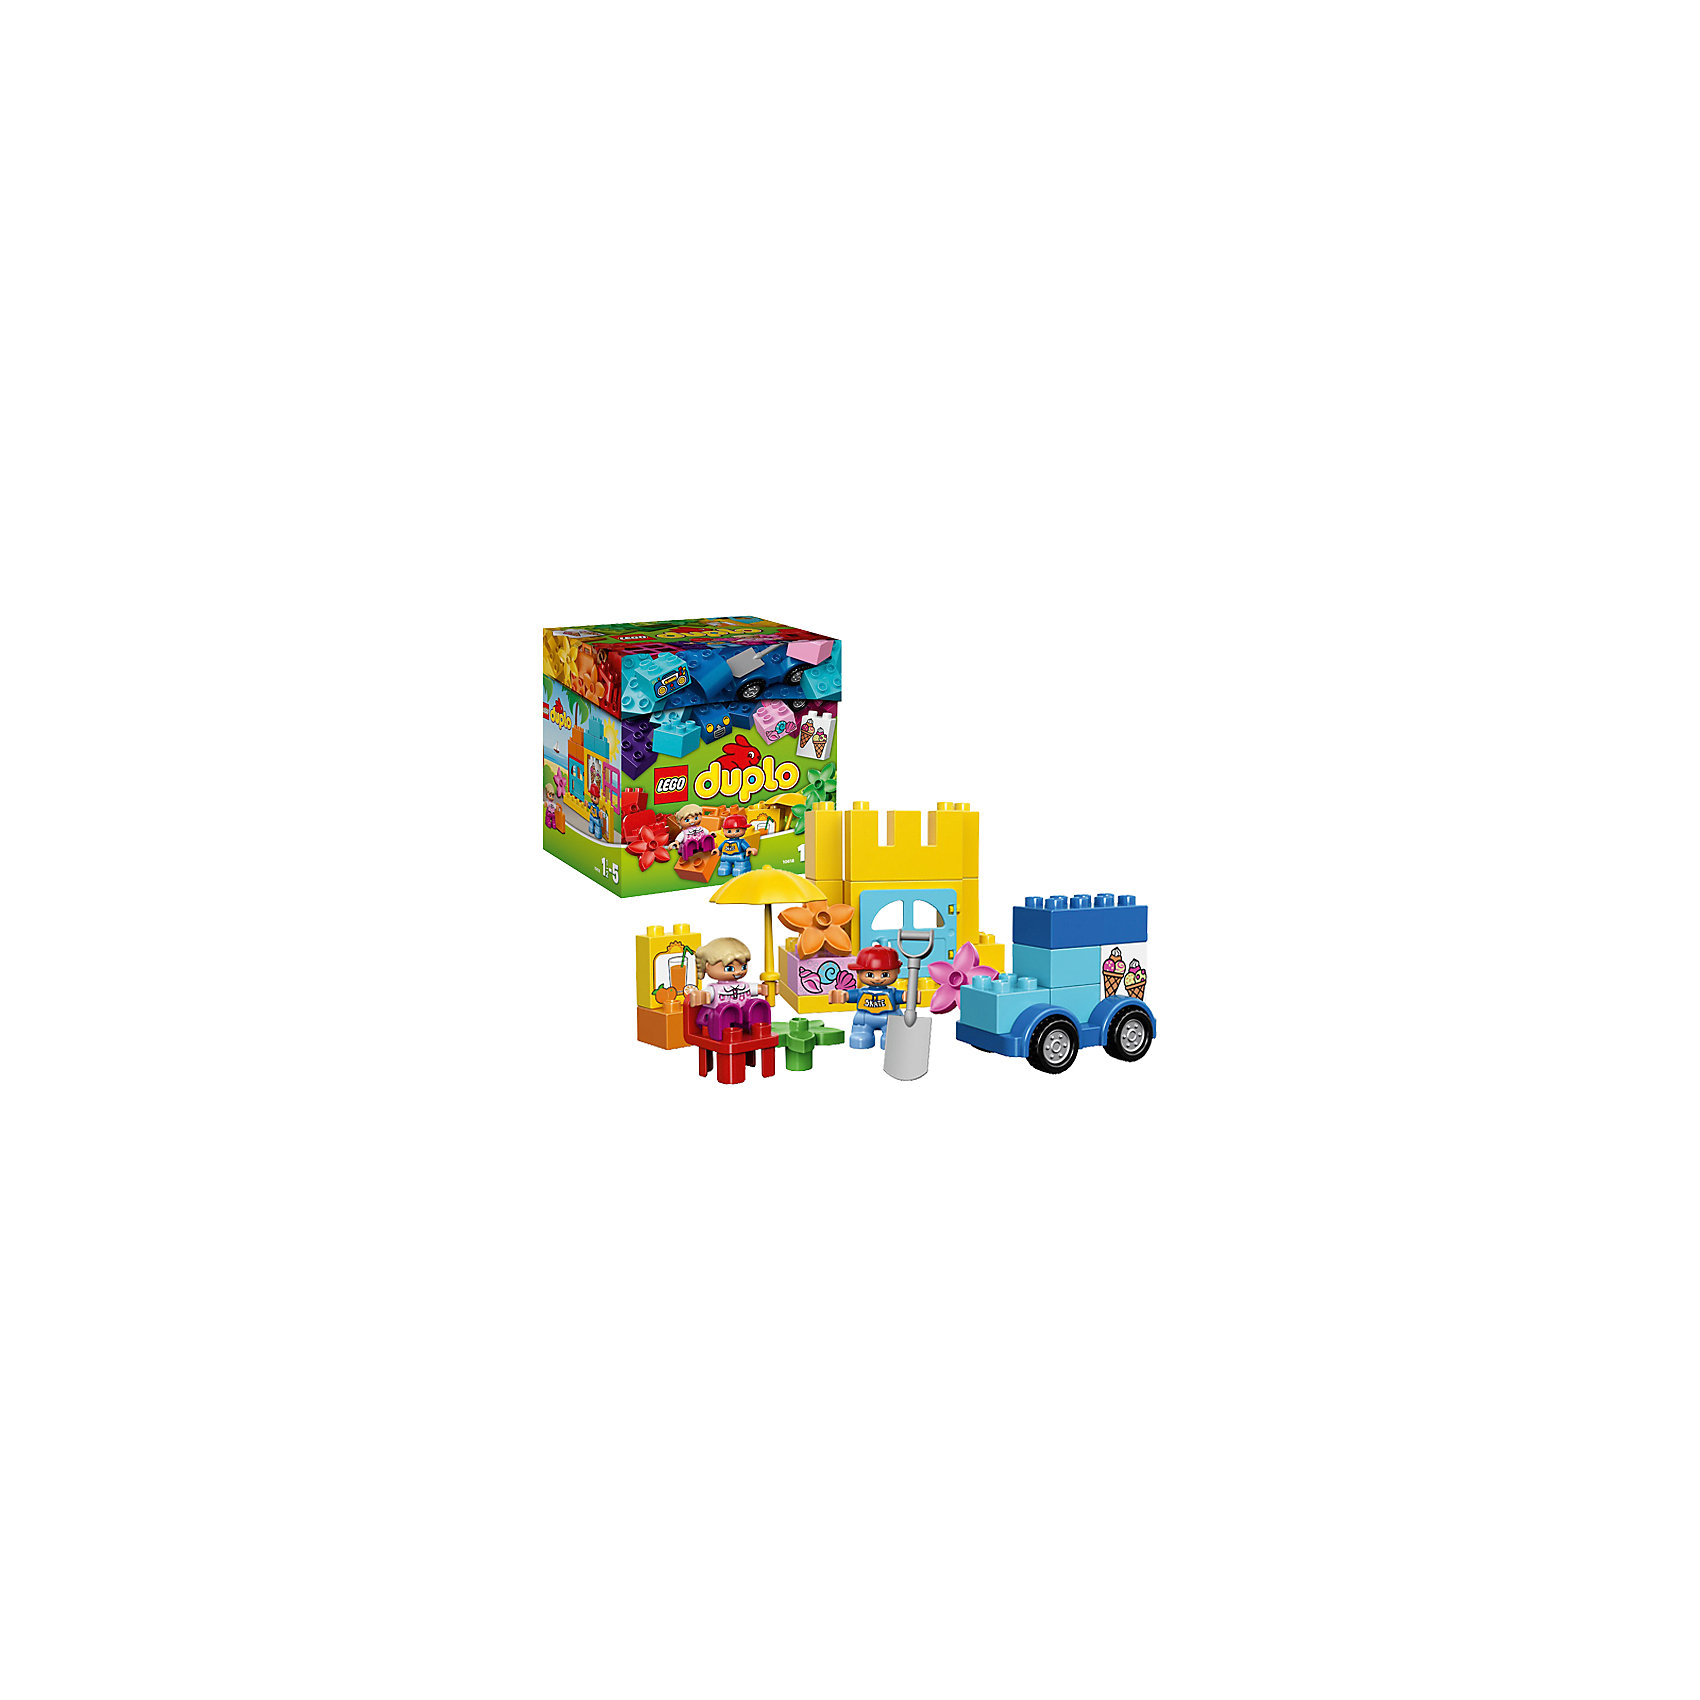 LEGO LEGO DUPLO 10618: Весёлые каникулы lego lego duplo 10586 фургон с мороженым